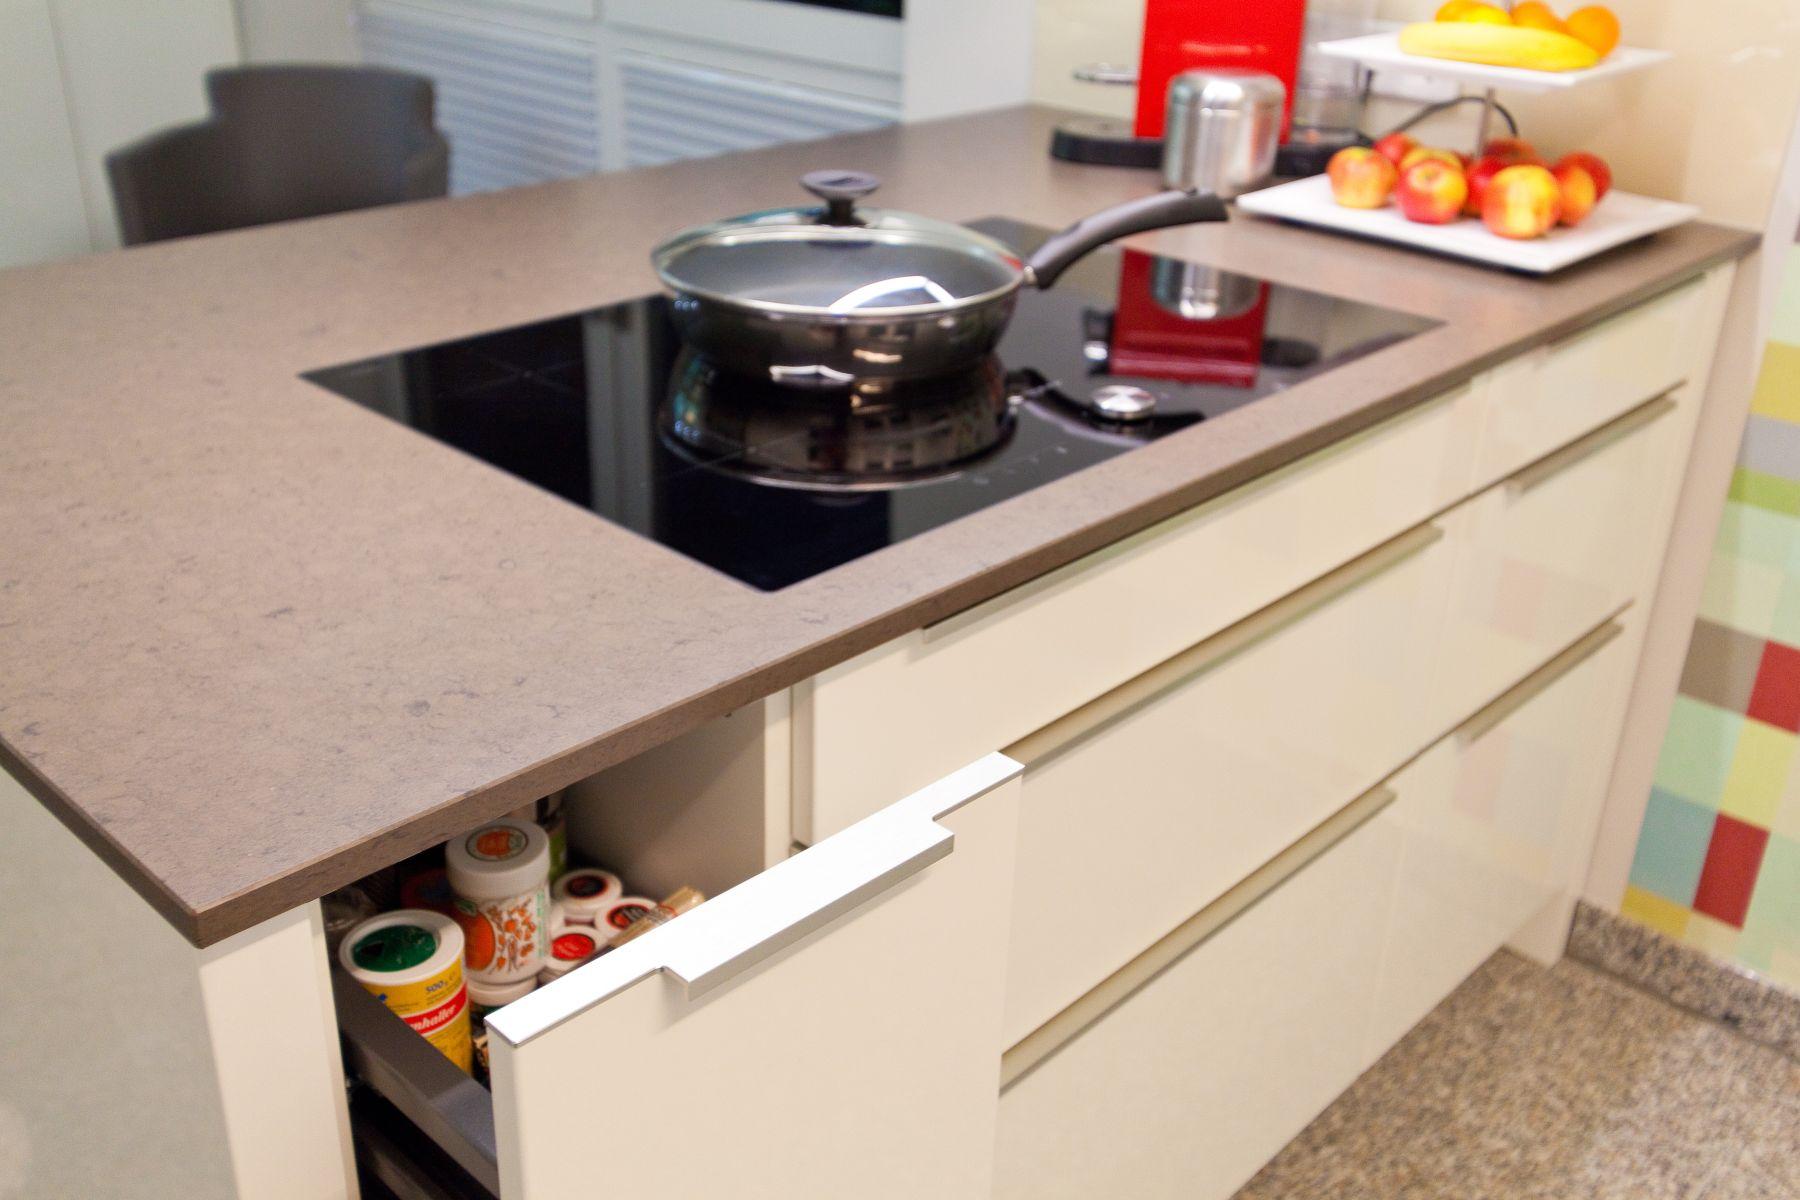 Full Size of Farbige Arbeitsplatten Küche Praktiker Arbeitsplatten Küche Schöne Arbeitsplatten Küche Quarz Arbeitsplatten Küche Preise Küche Arbeitsplatten Küche